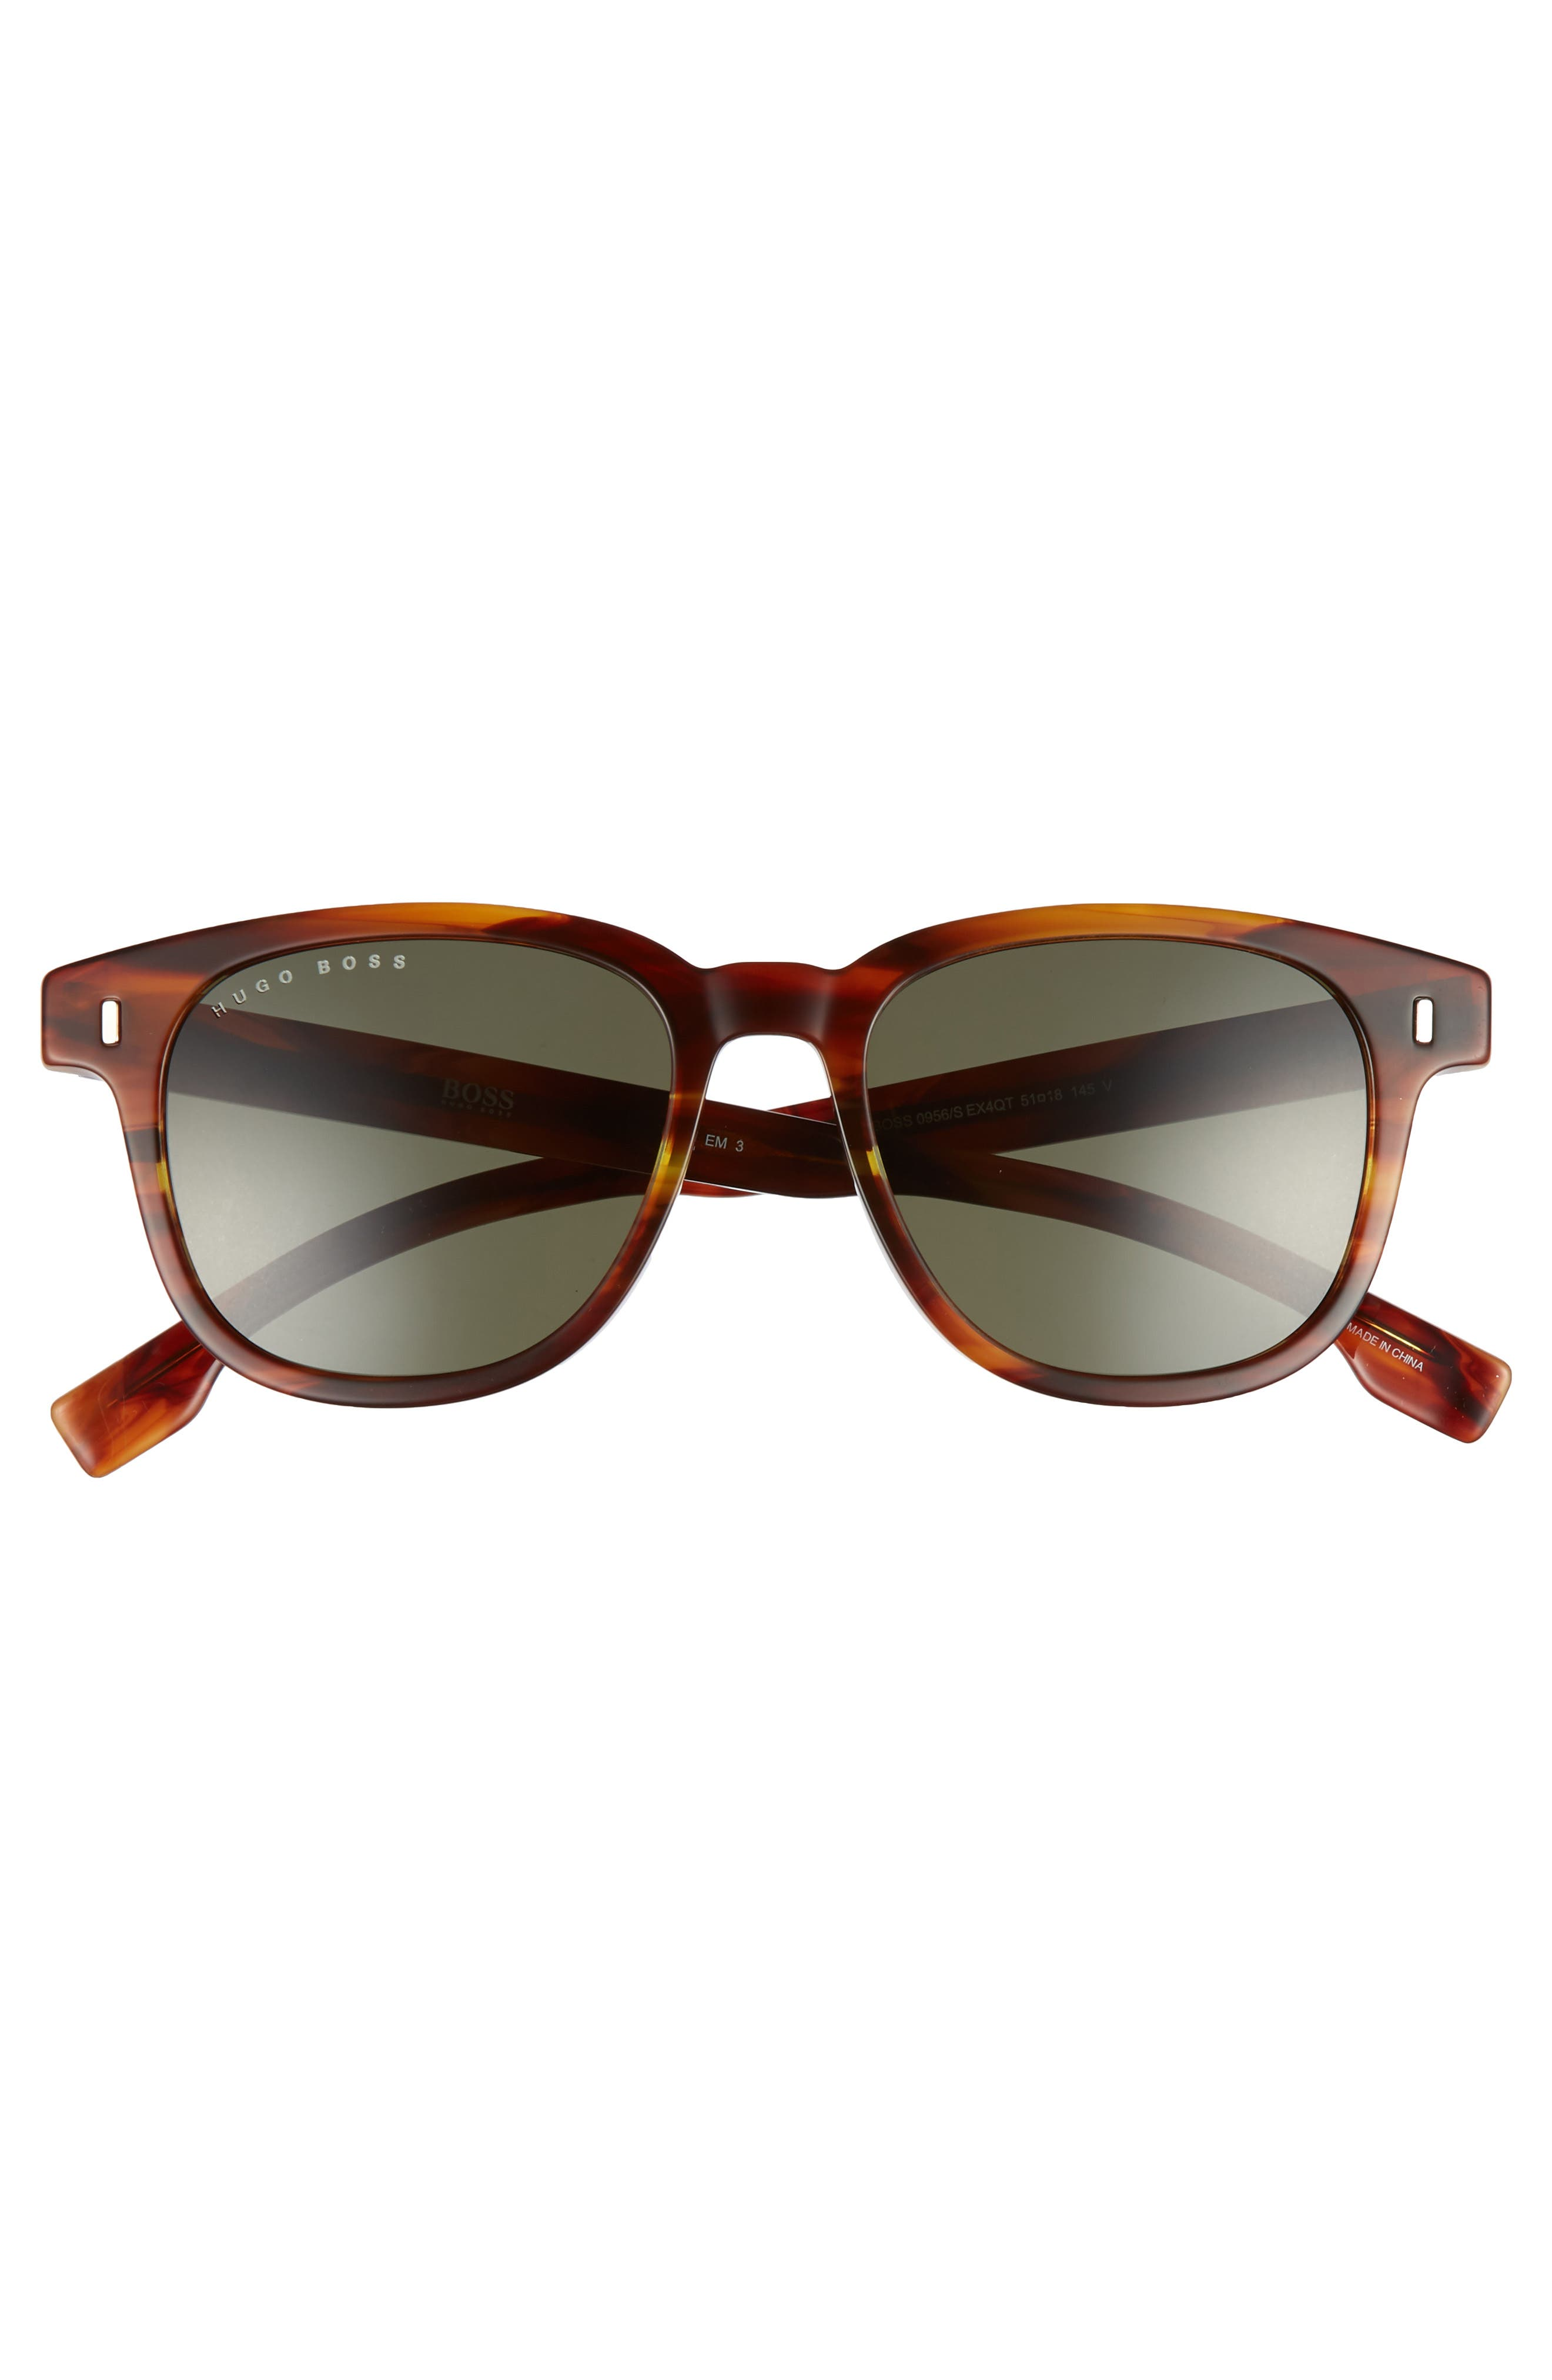 51mm Polarized Sunglasses,                             Alternate thumbnail 2, color,                             Brown Horn